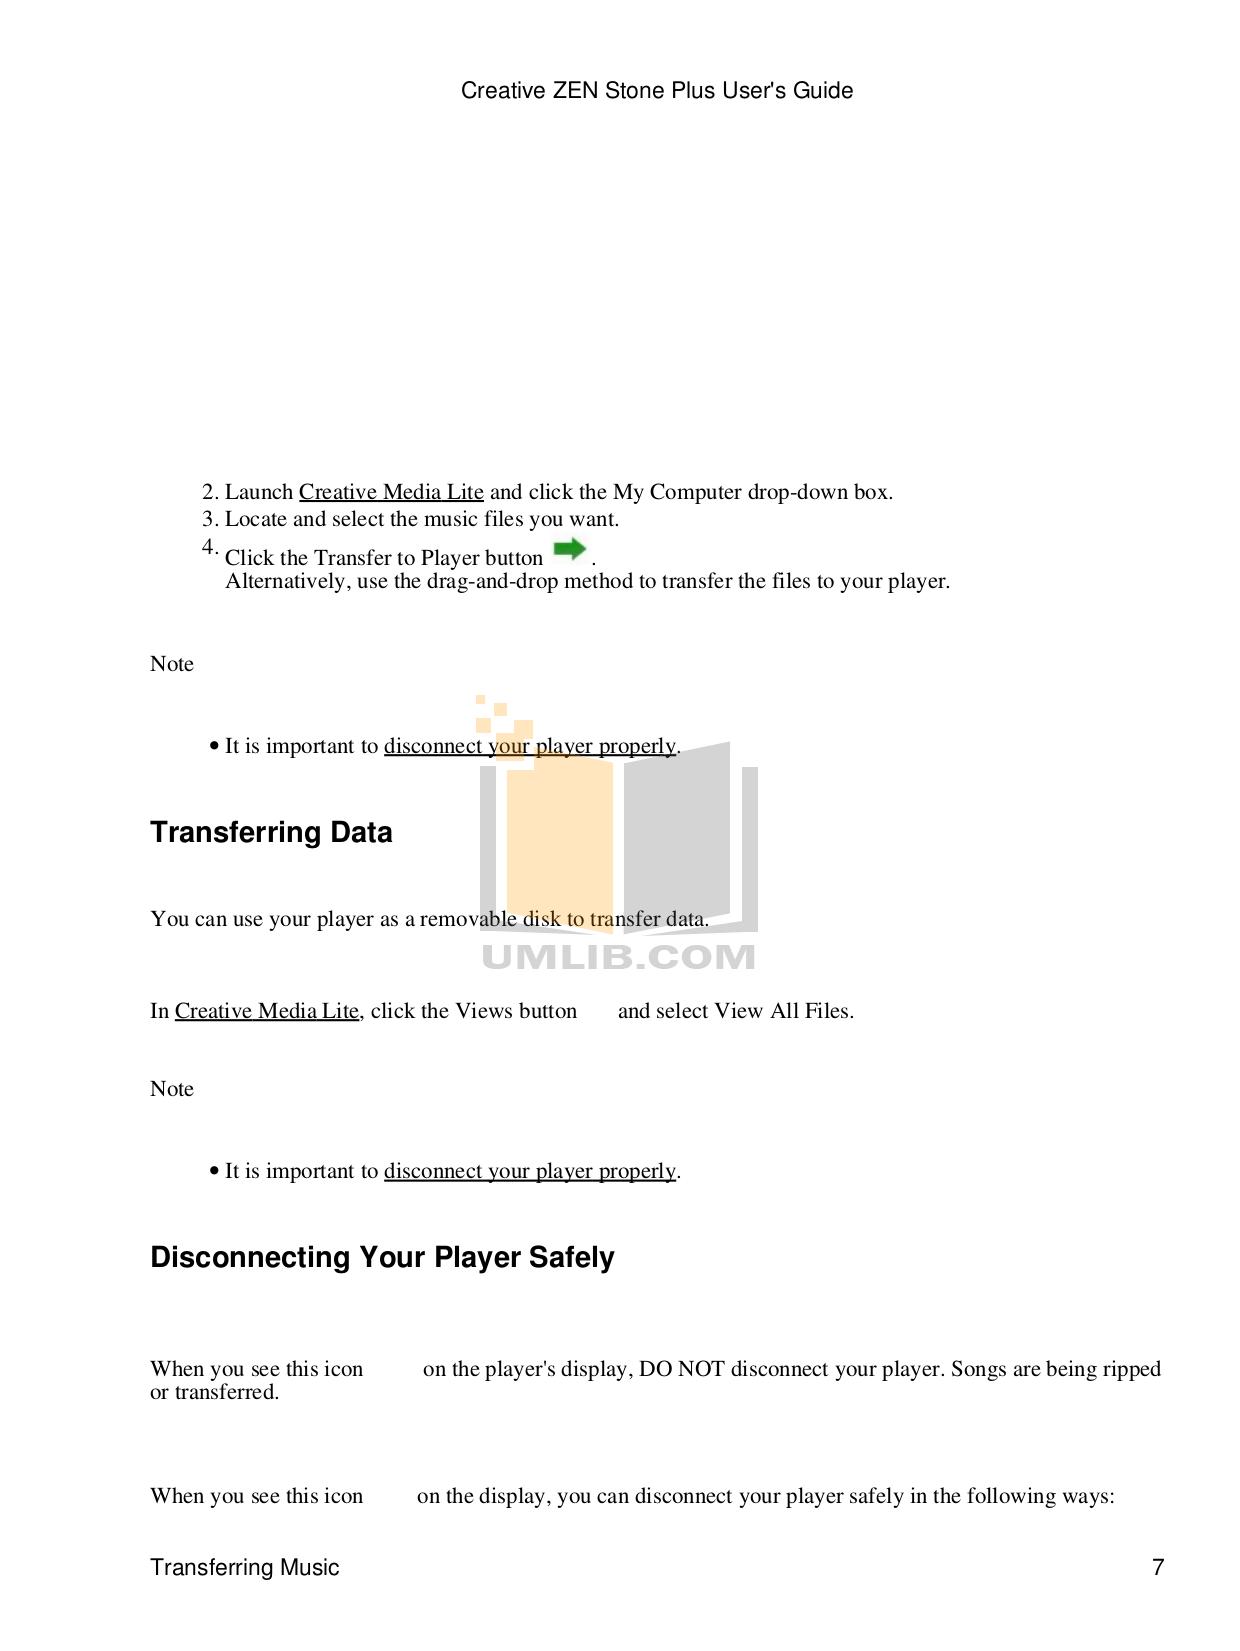 pdf manual for creative mp3 player zen zen stone plus 2gb rh umlib com Creative Zen Manual PDF creative zen stone manual pdf